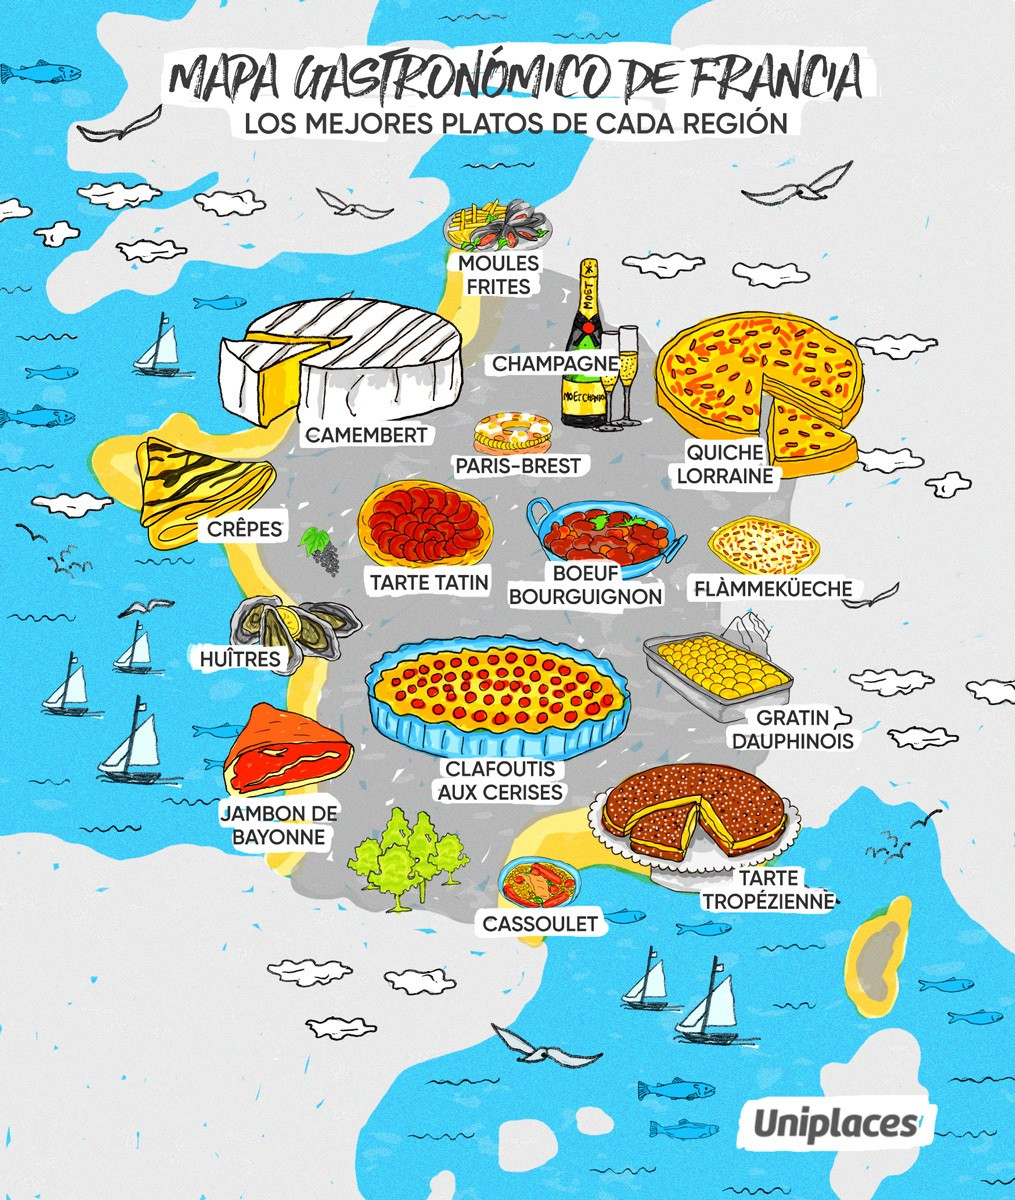 mapa gastronomia francesa